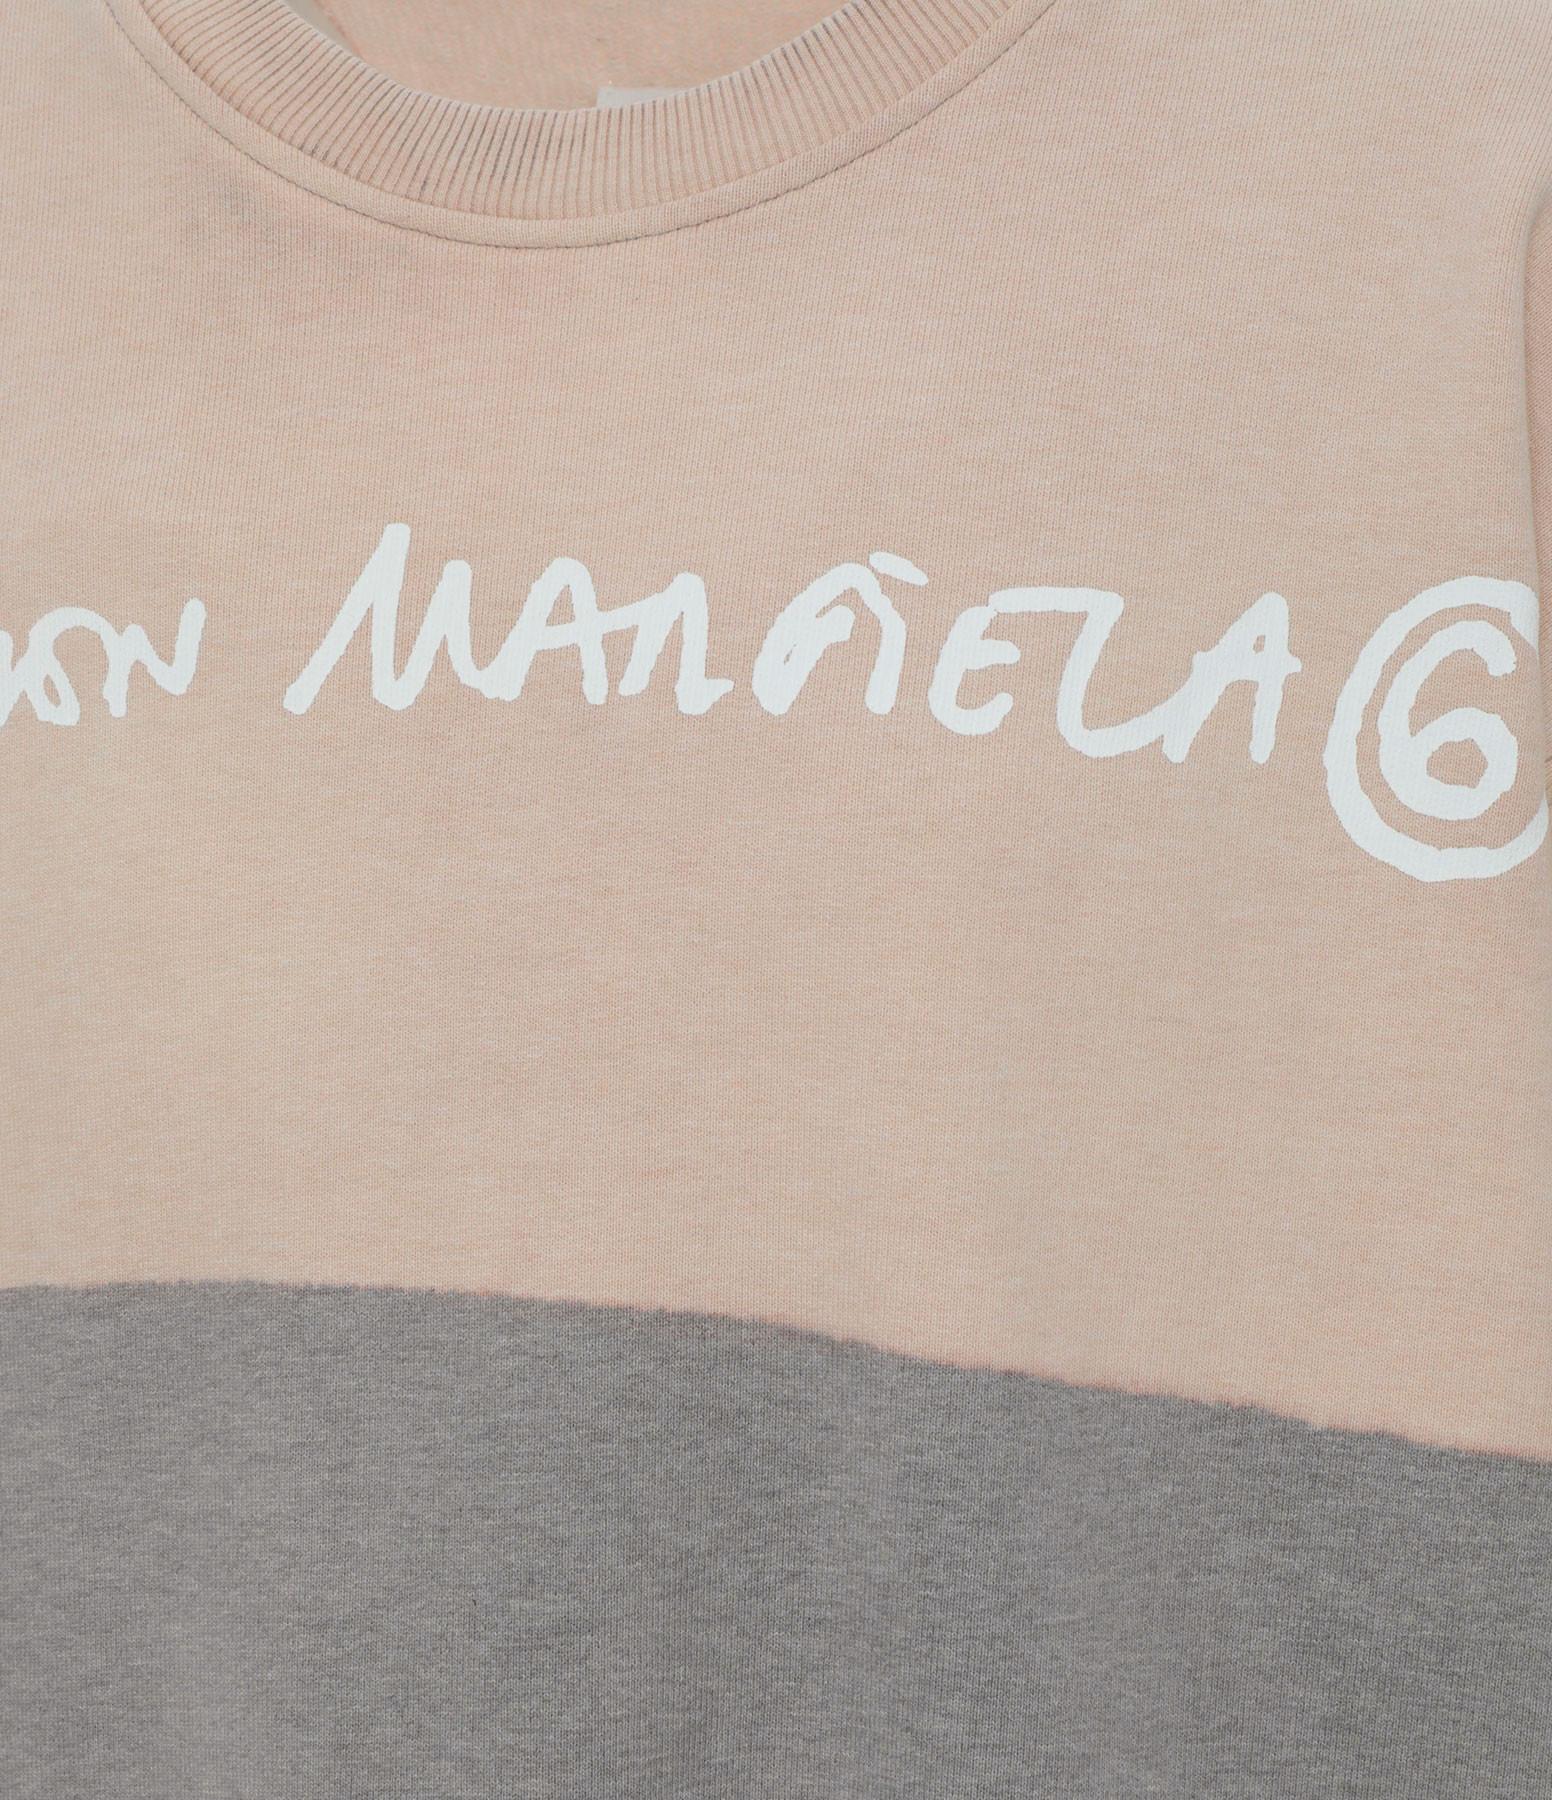 MM6 MAISON MARGIELA - Robe Sweatshirt Oversize Coton Gris, Collection Studio